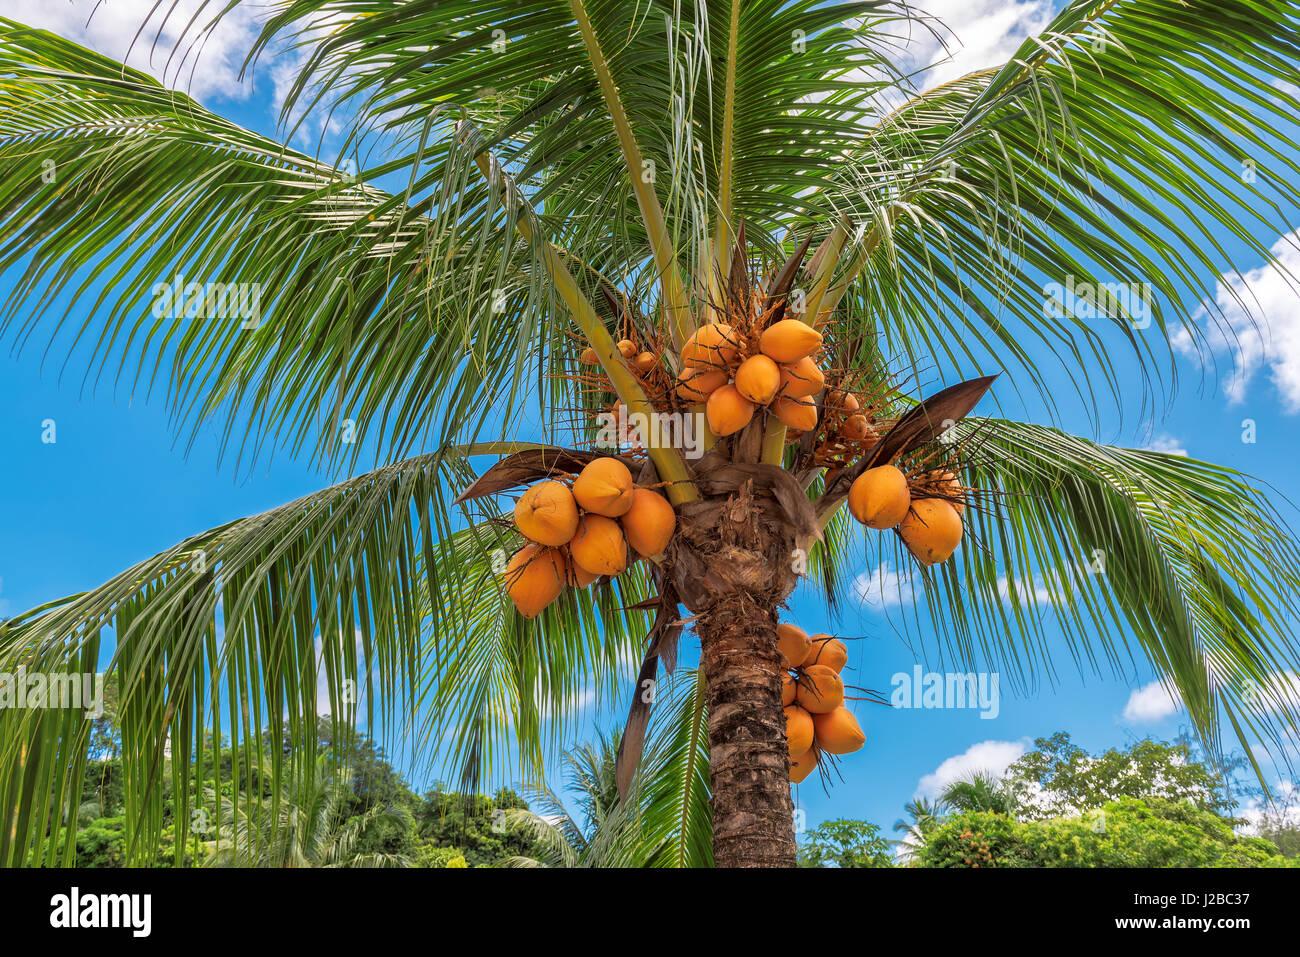 Orange coconut on palm tree - Stock Image